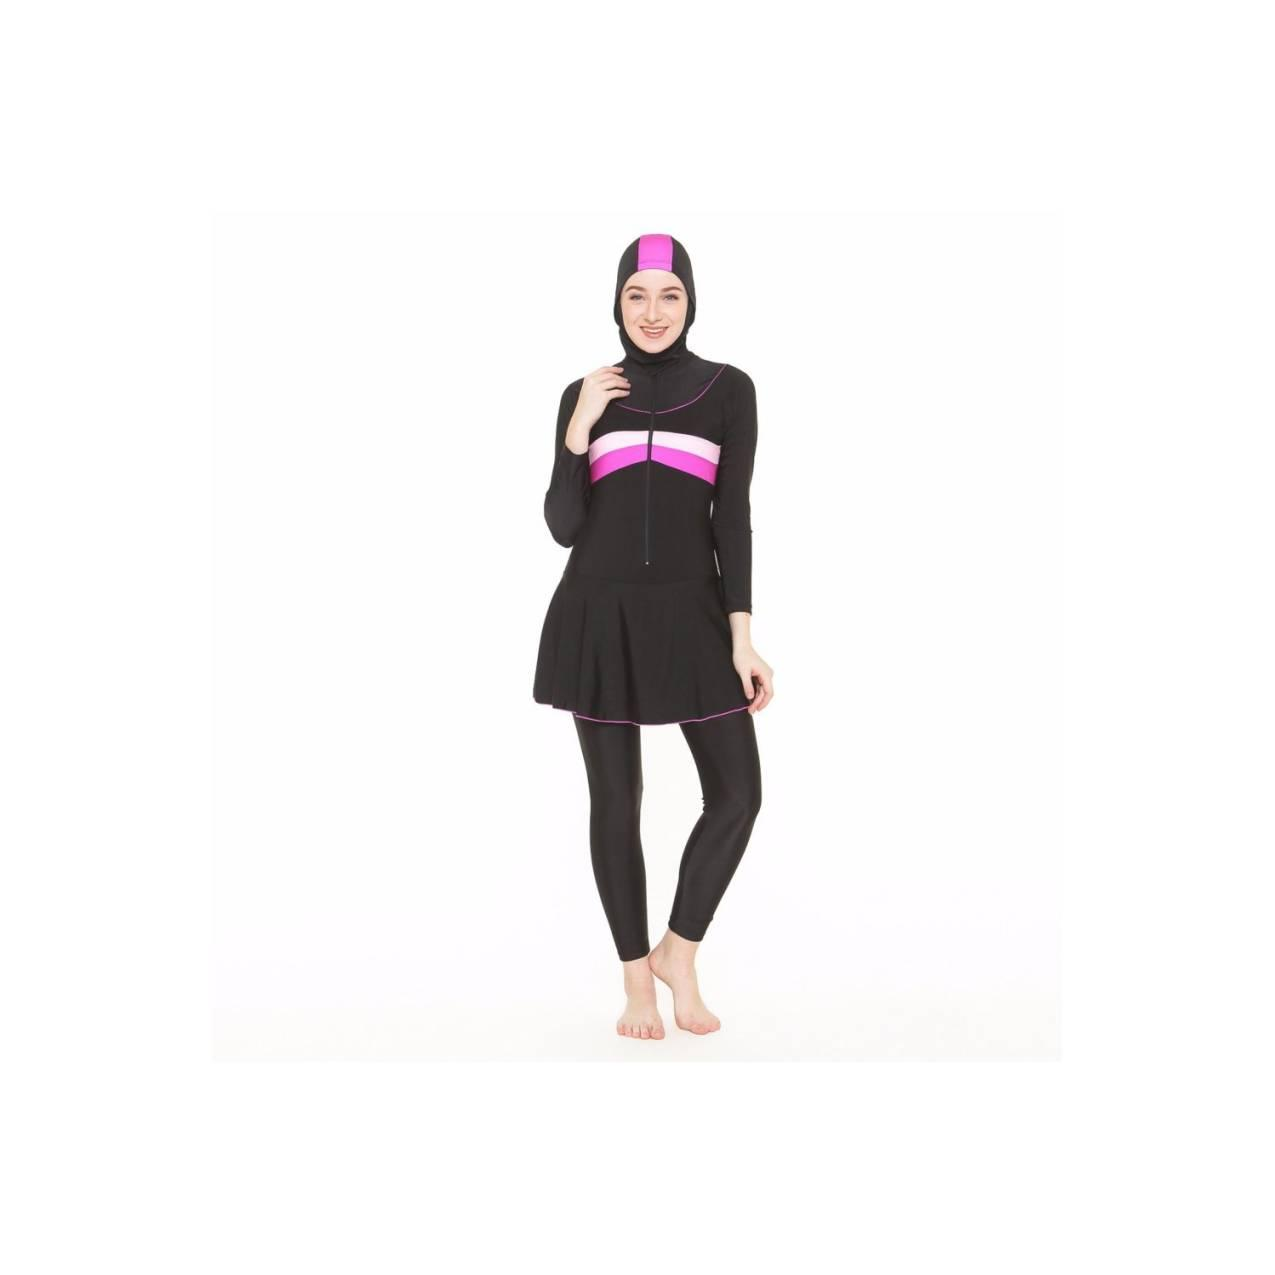 Laris Edora Sport Baju Baju Renang Muslimah Dewasa ES-ML-DW-1